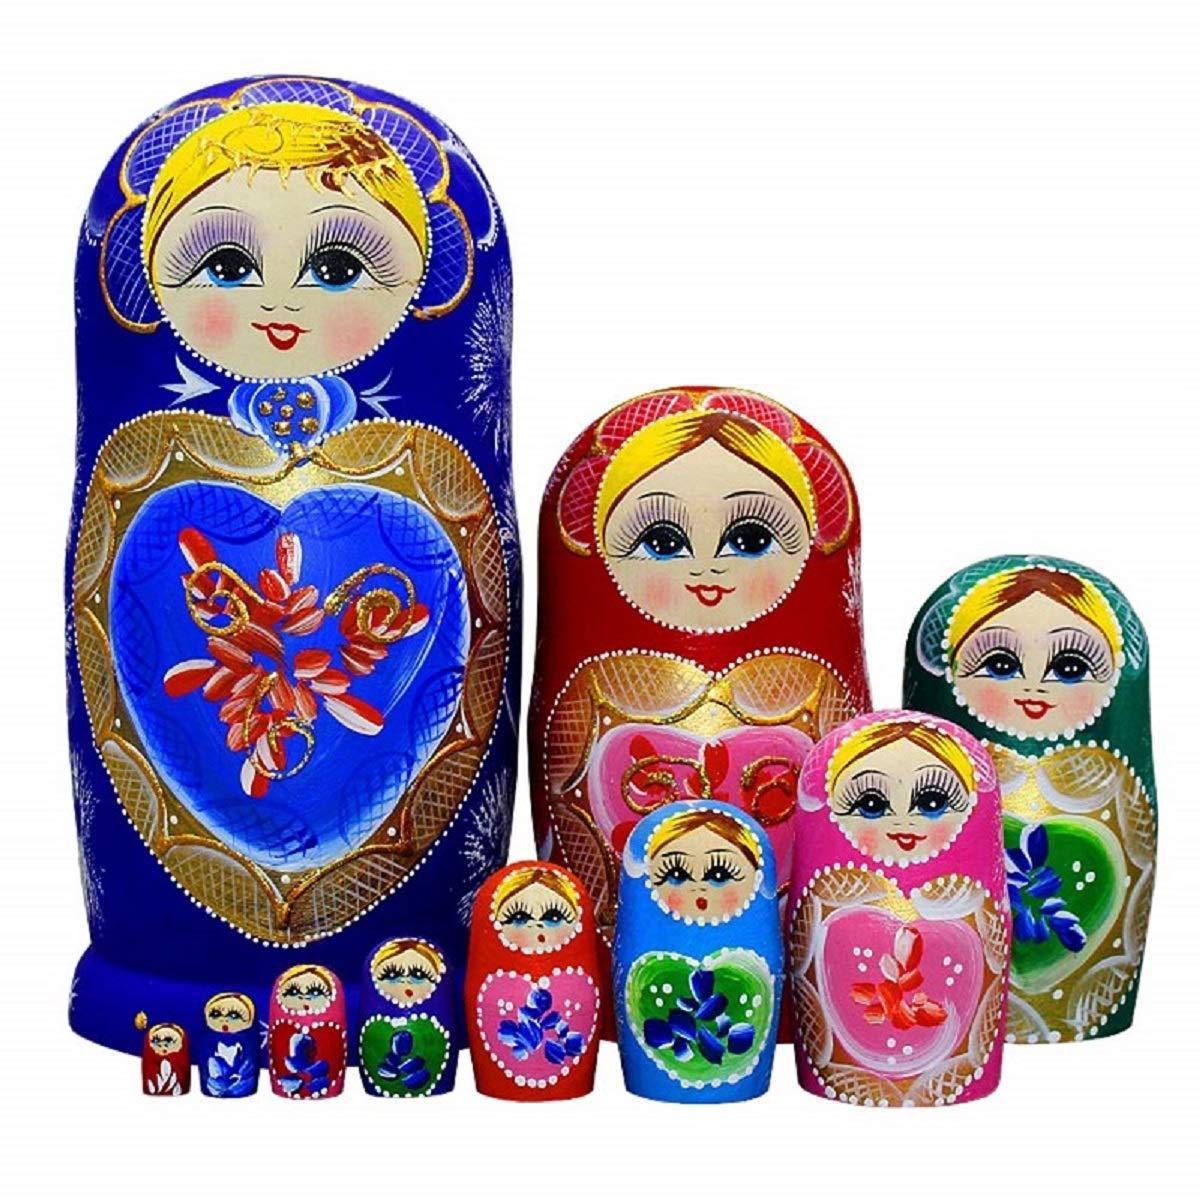 King&Light 10pcs B Heart-shaped pattern Wooden nesting toys Russian dolls Matryoshka stacking dolls by LK